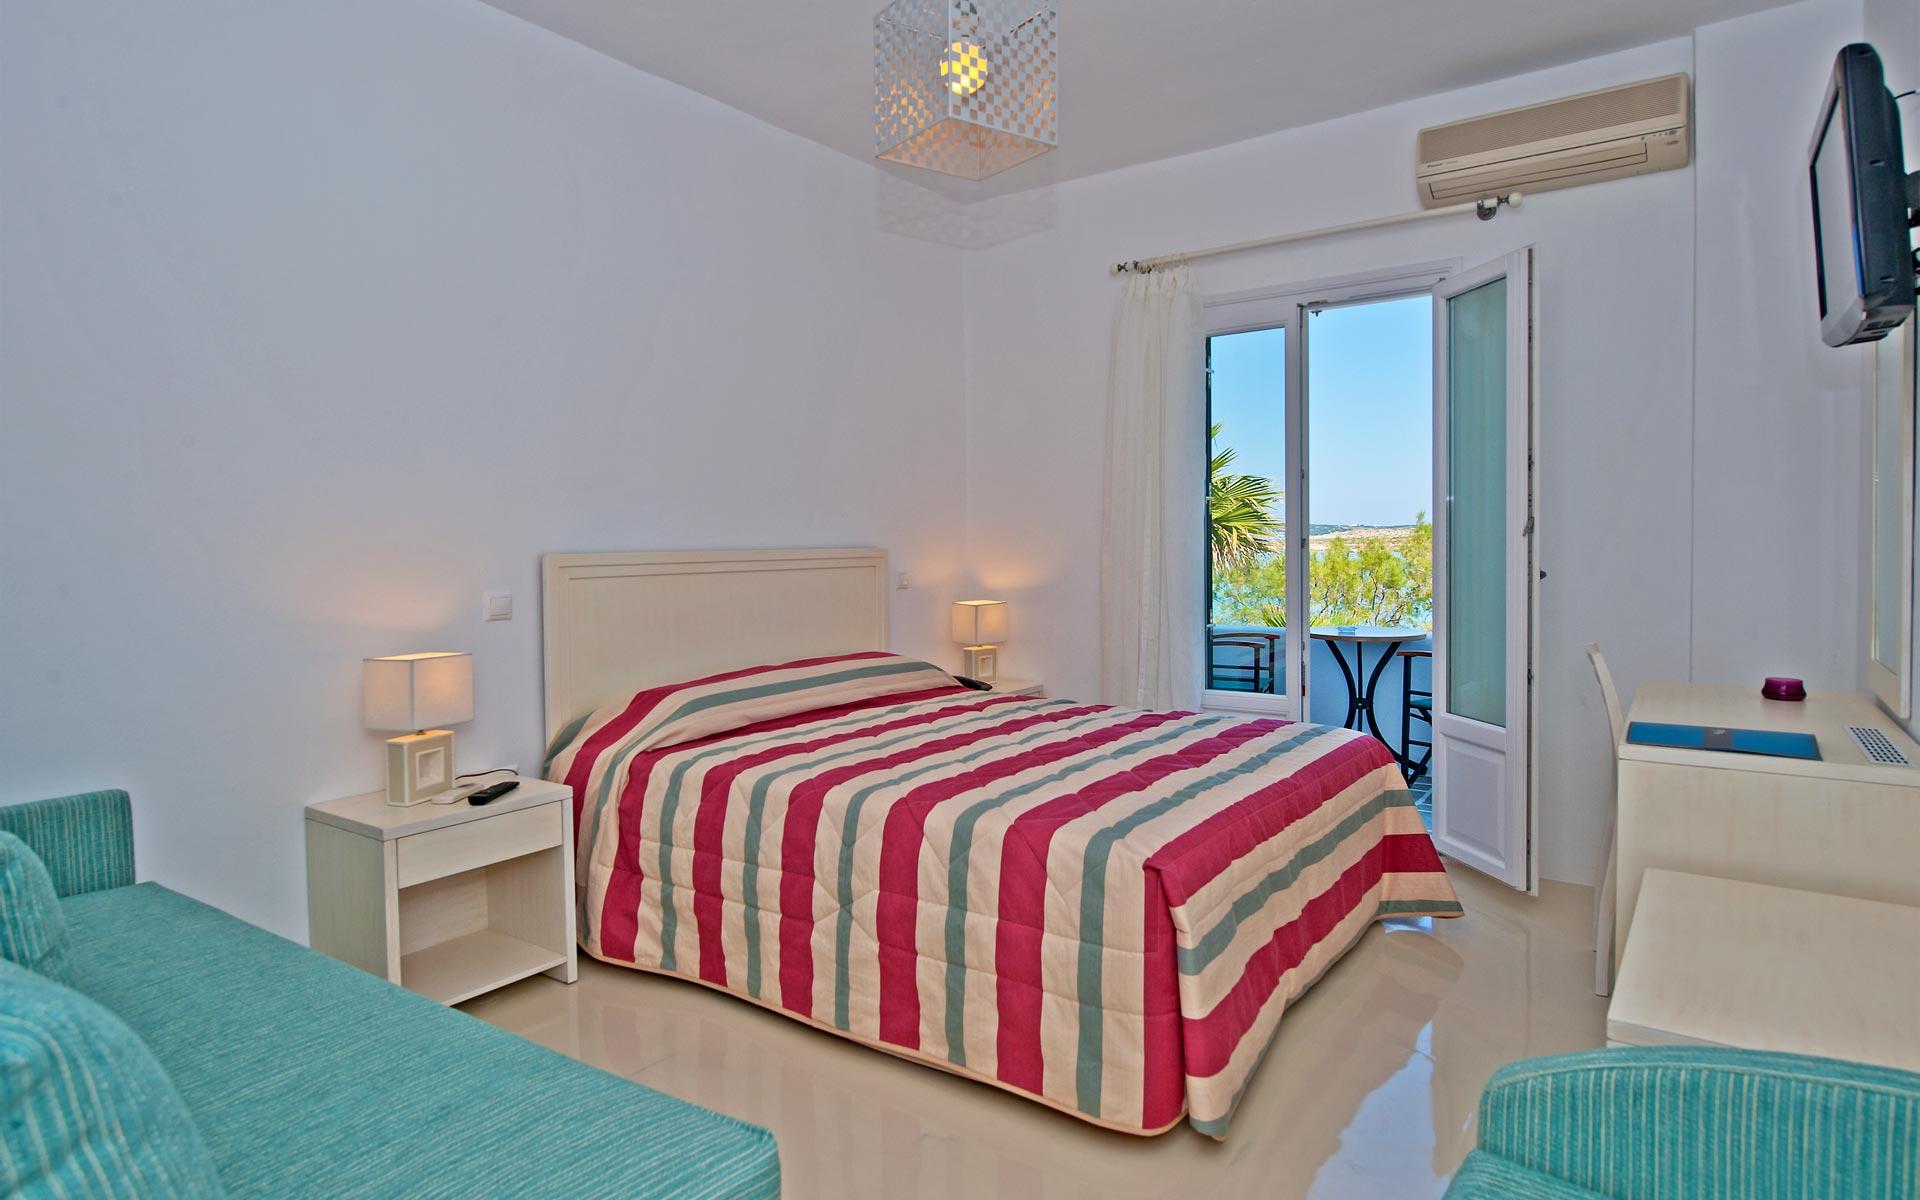 kalypsohotel-rooms-paros3